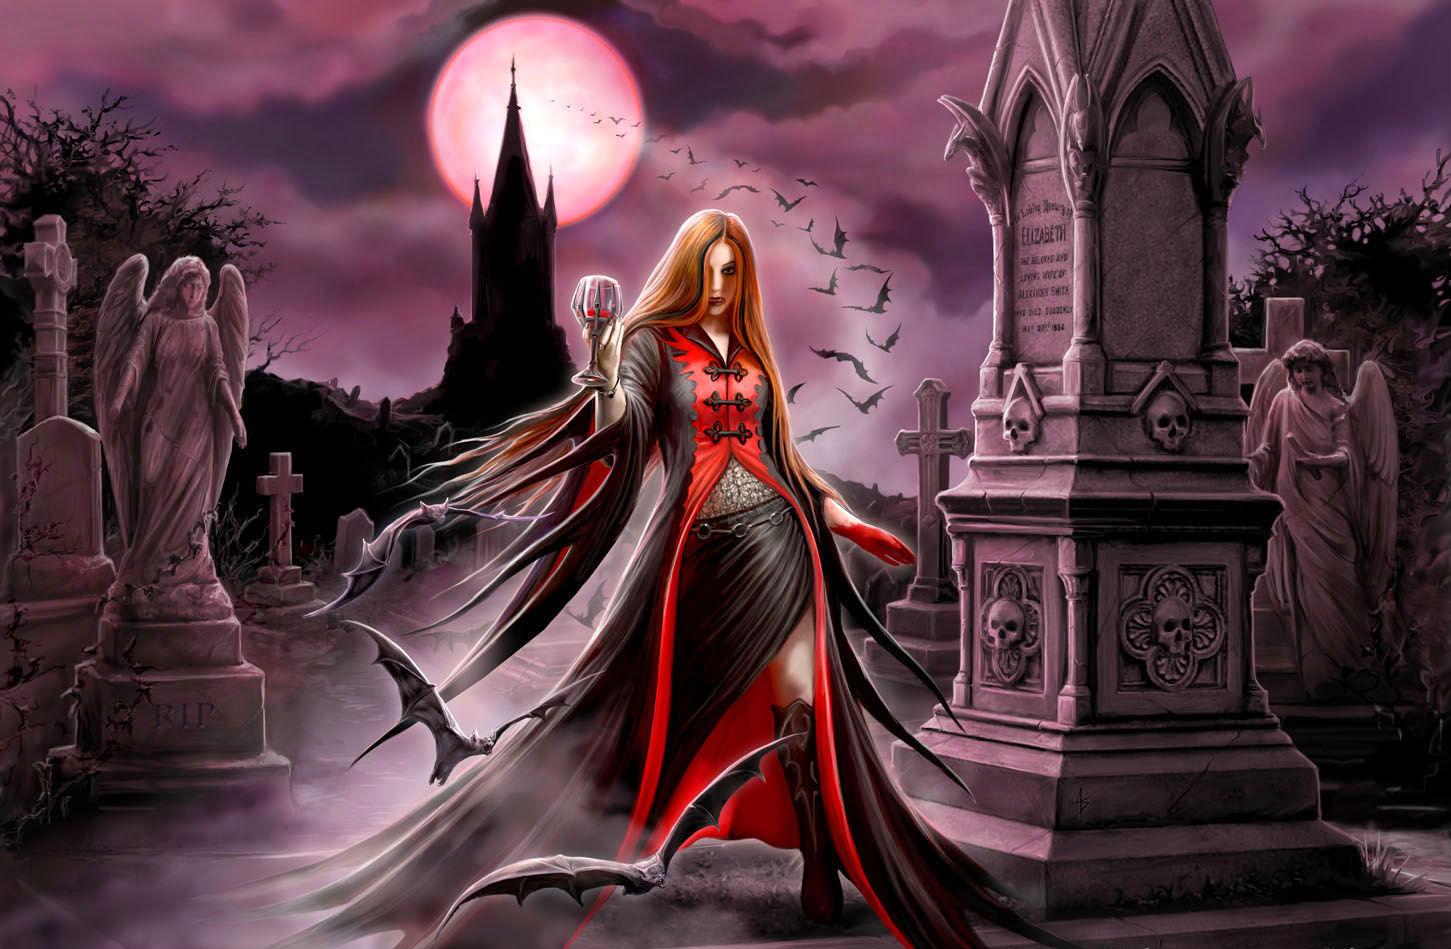 Image-detail-for-Blood-Moon-abstract-cemetary-creepy-dark-dark-art-graveyard-wallpaper-wp5806806